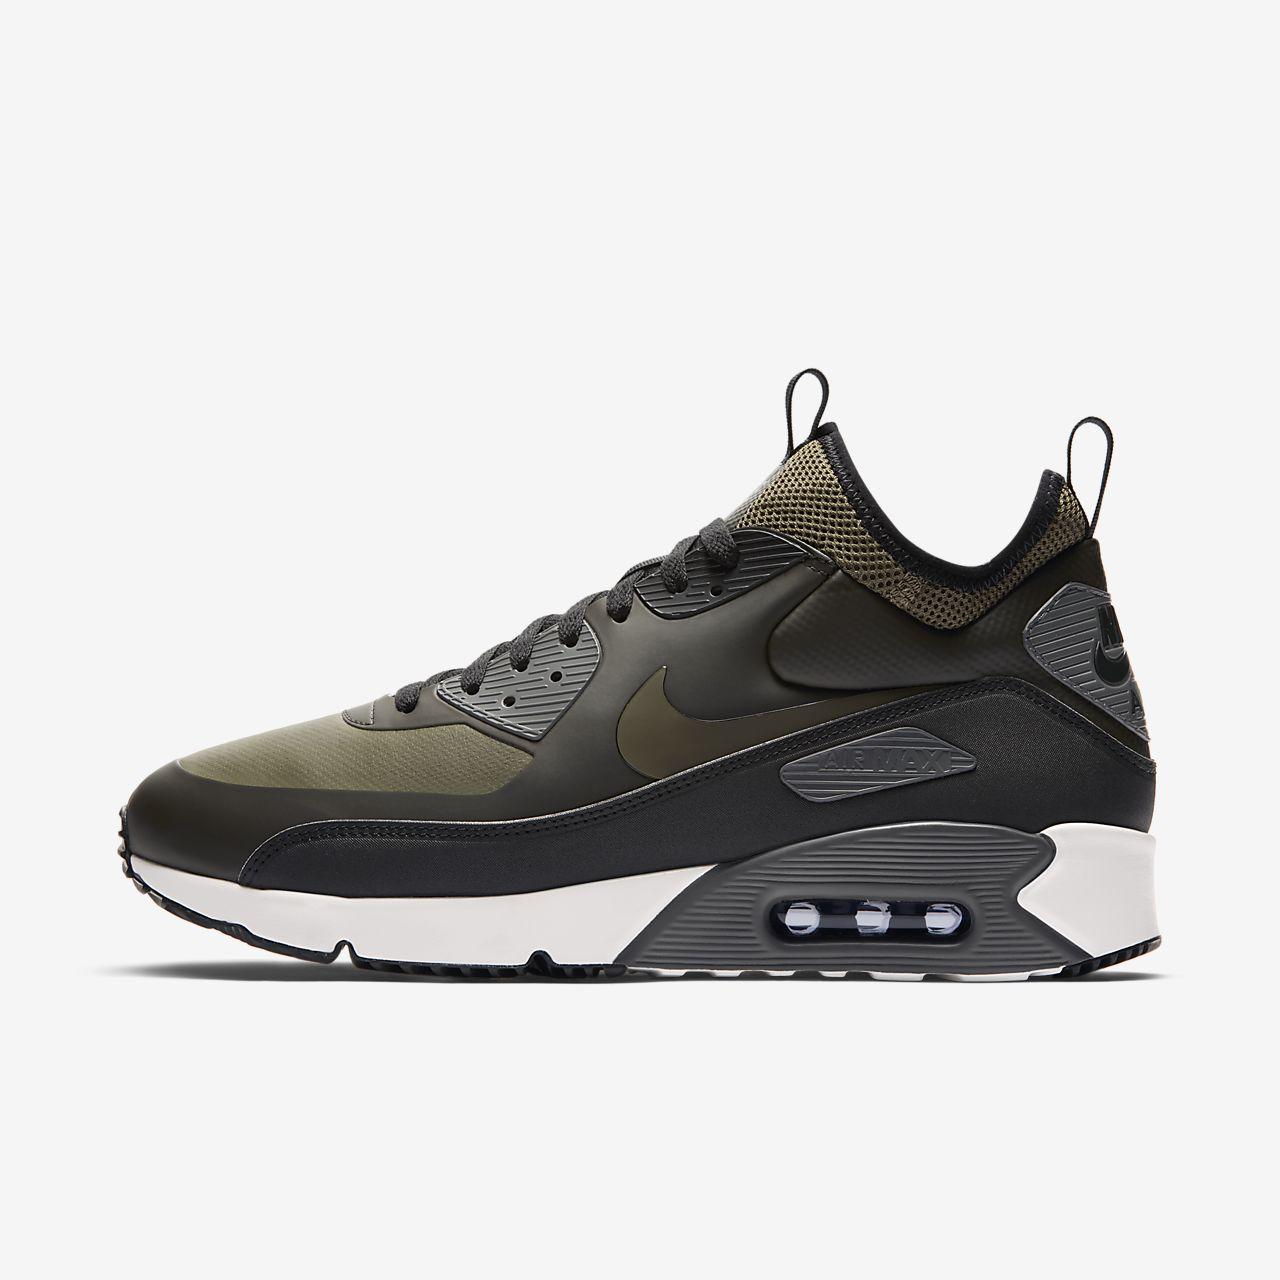 nike air max 90 ultra mid winter - herren sneakers